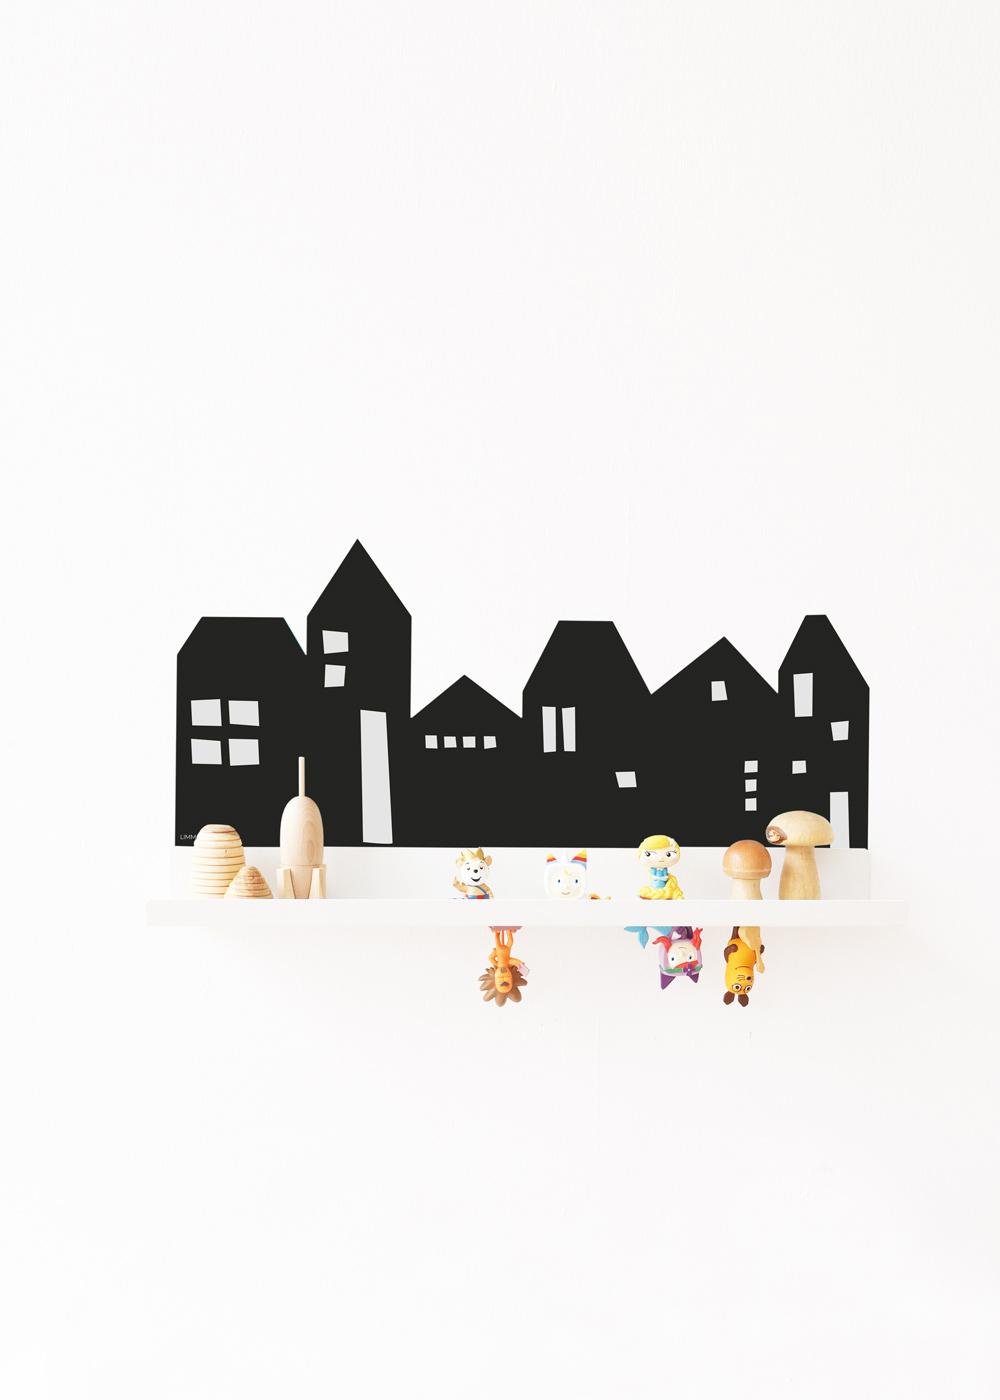 Klebefolie Malmbäck Bilderleiste Lille Hus schwarz